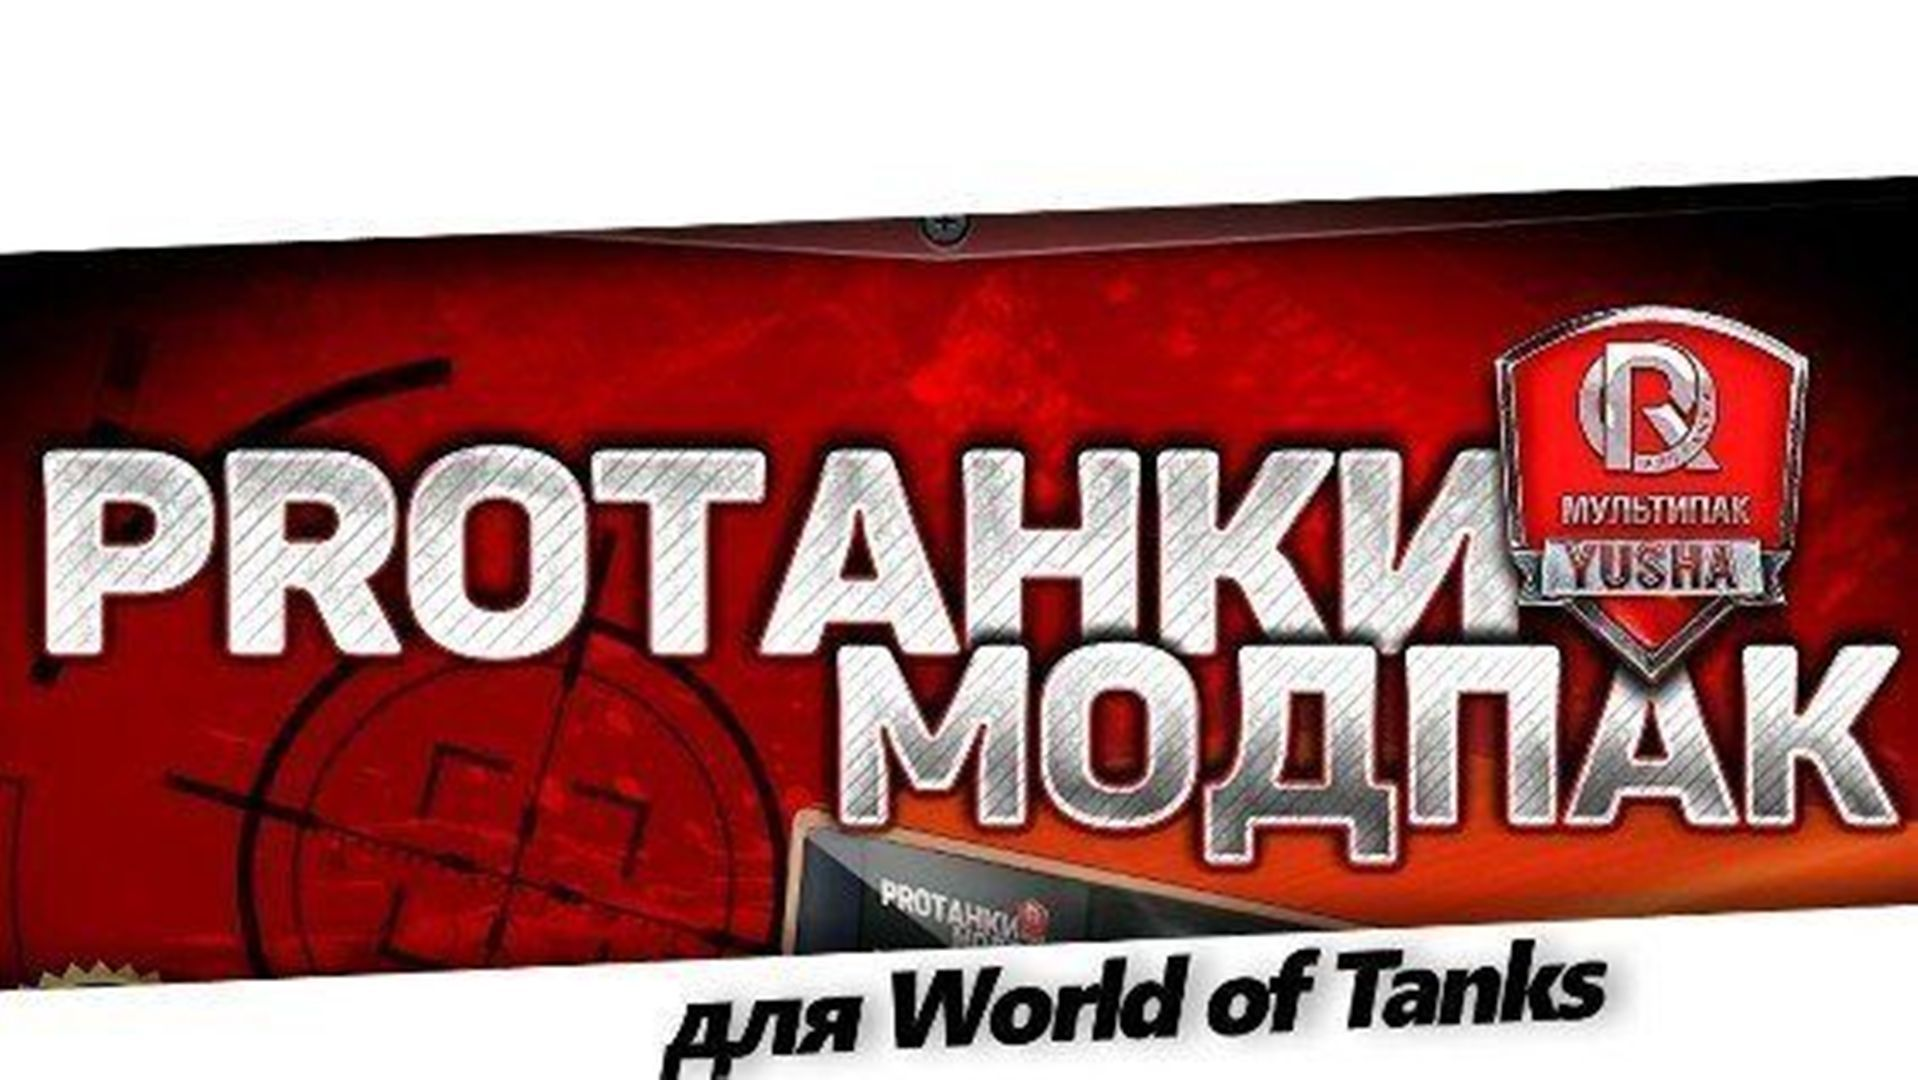 Моды от ПроТанки для World of Tanks